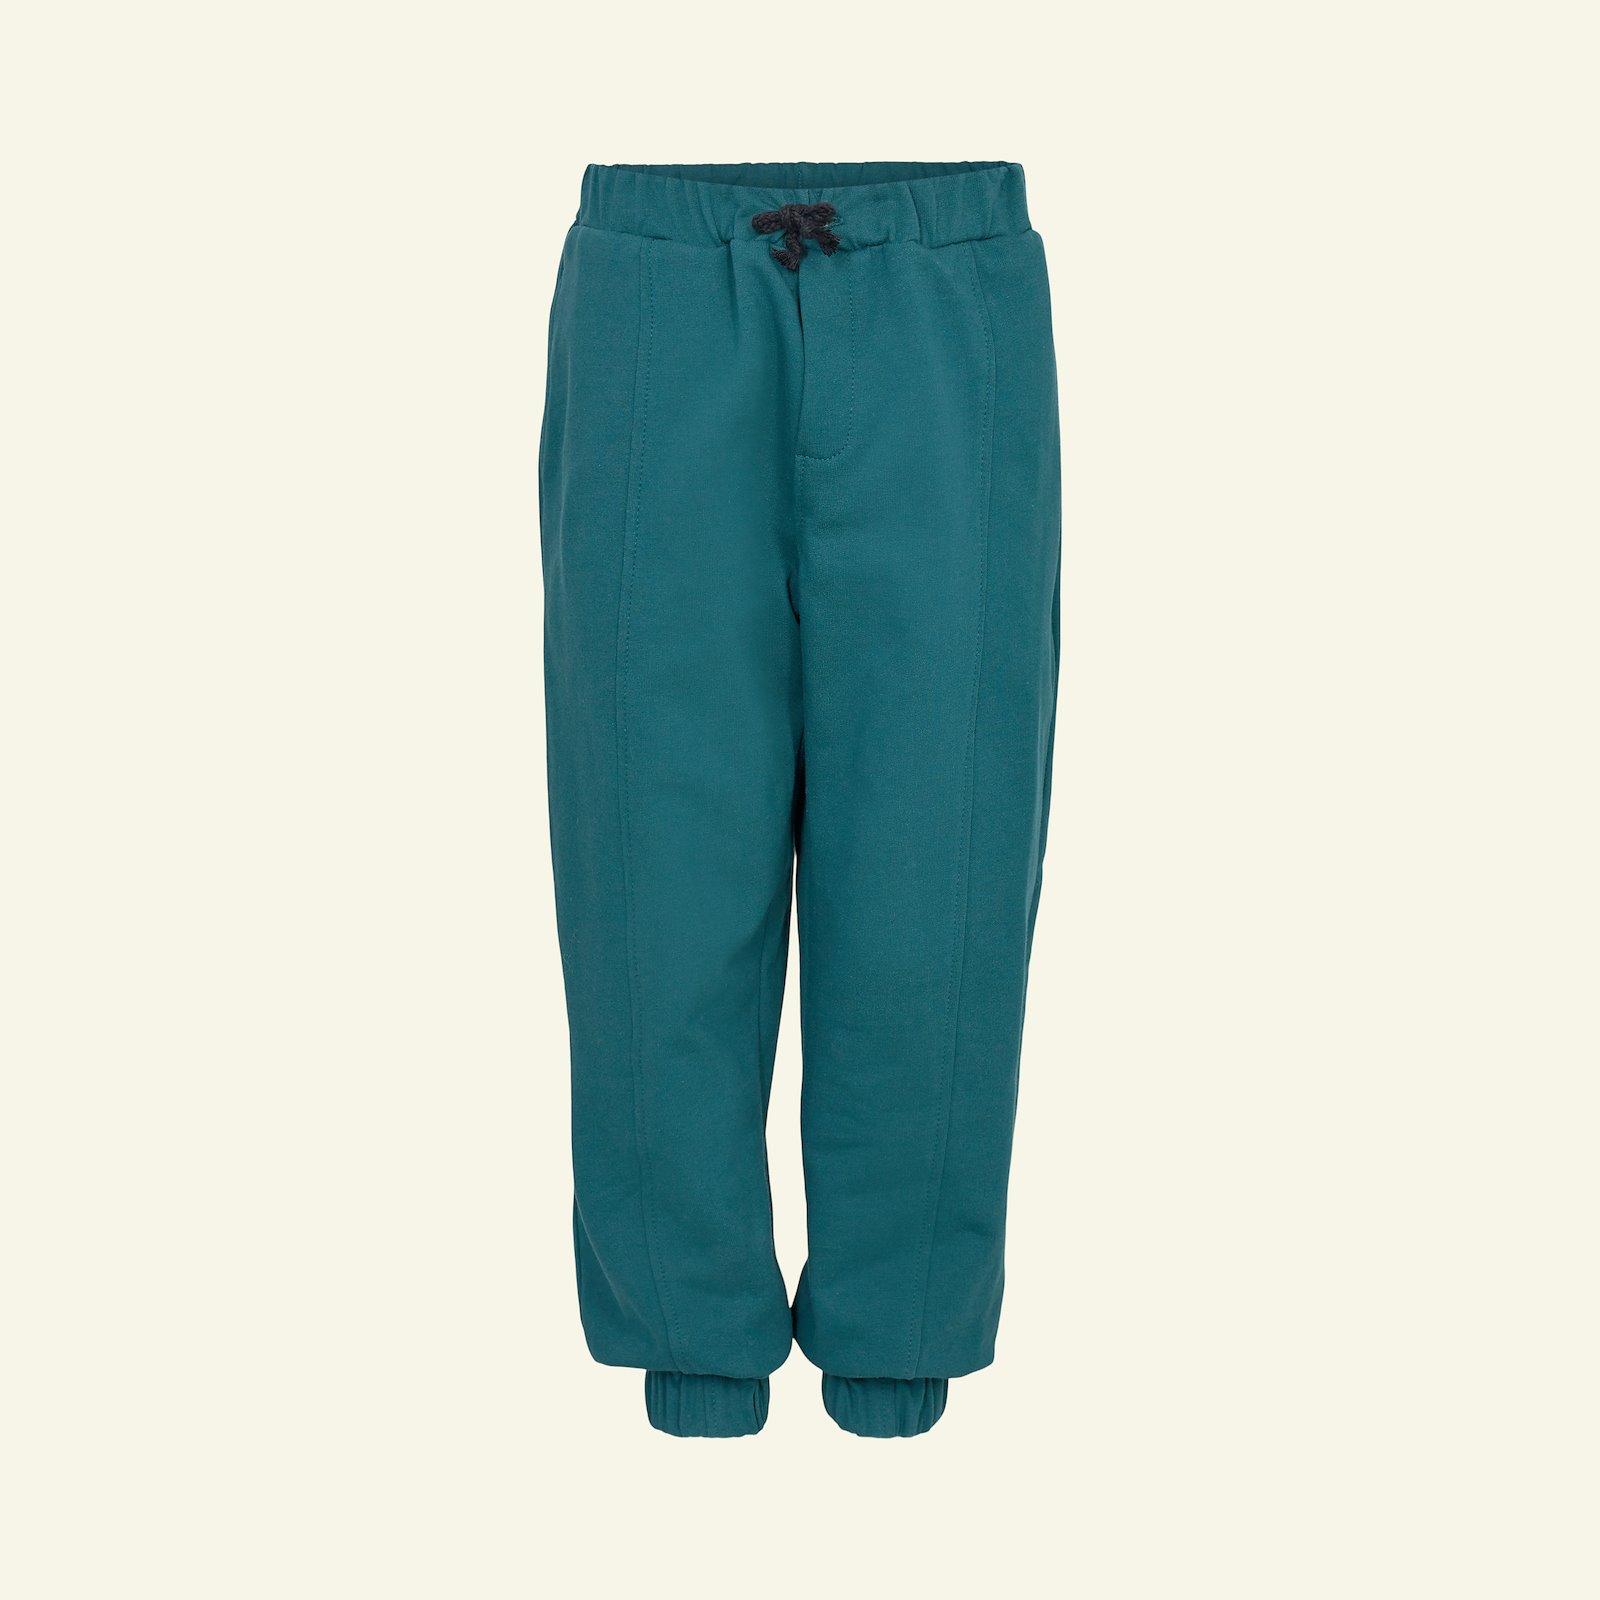 Sweat pants, 116/6y p60040_211775_75243_sskit